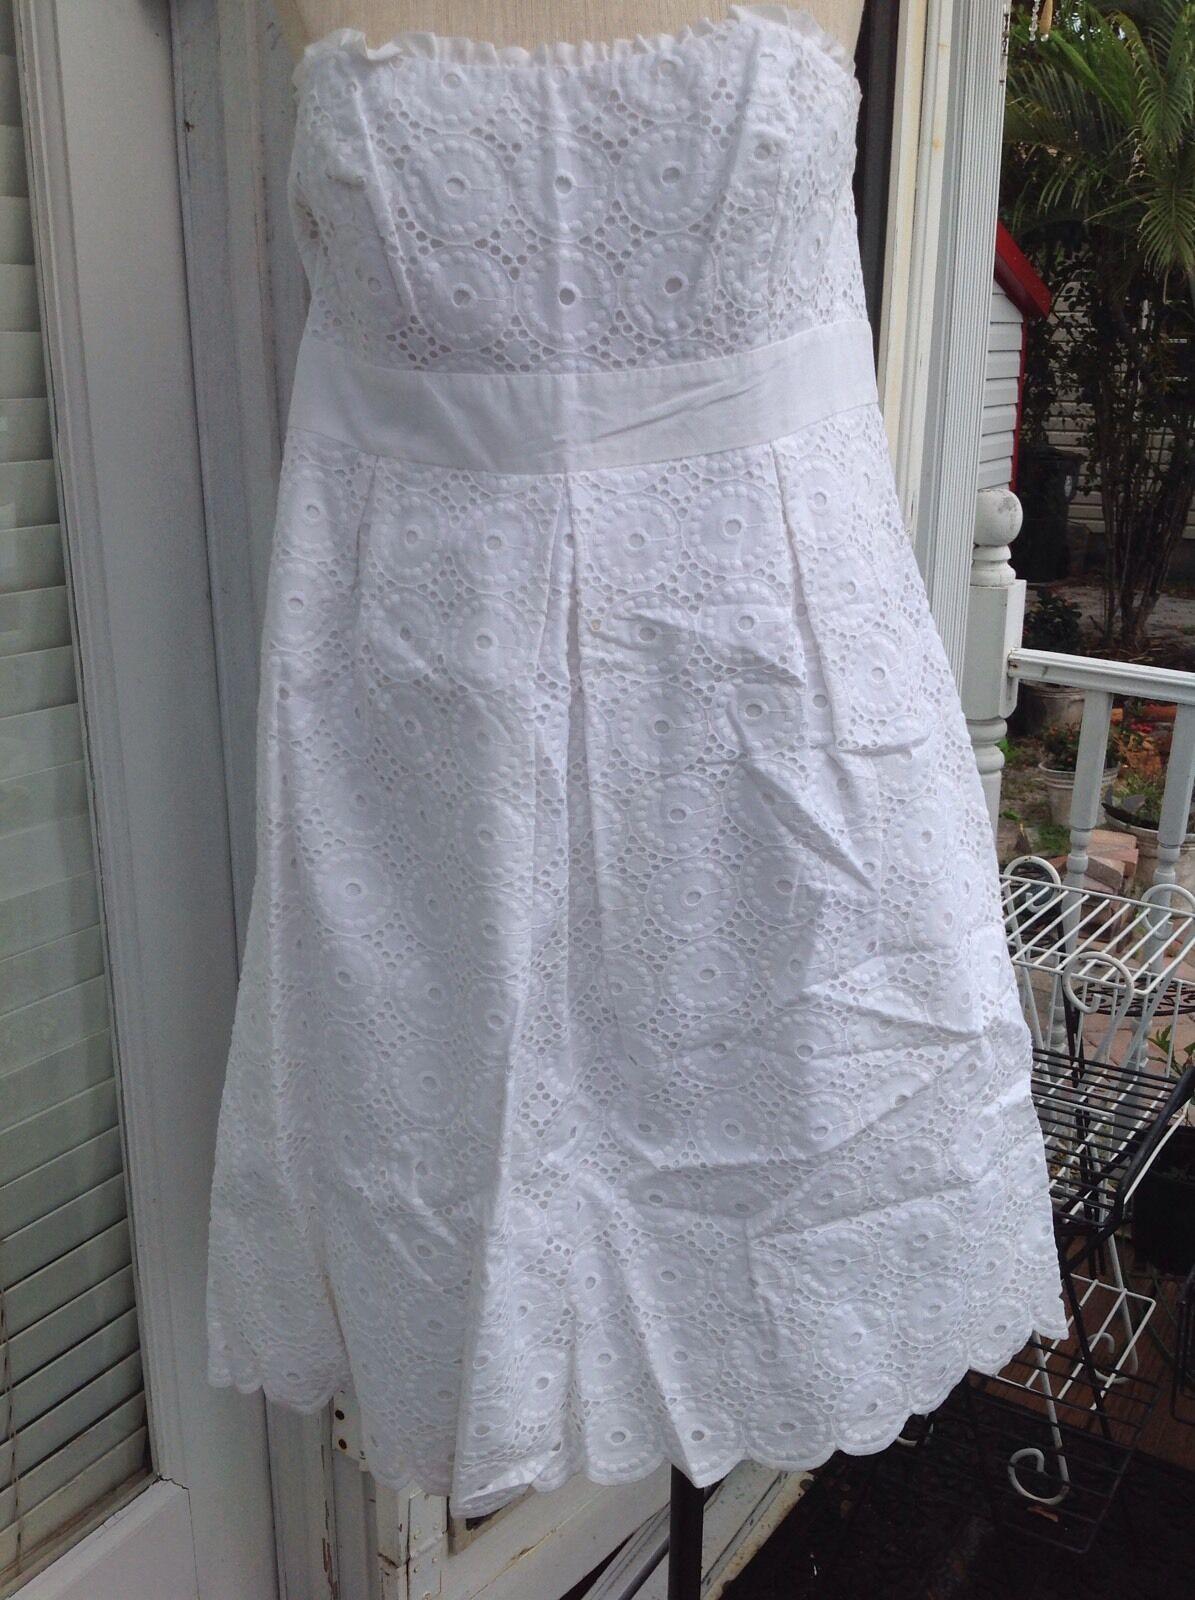 Lilly Pulitzer White Eyelet Circle Strapless Dress 12 L Large Scallop Hem NEW